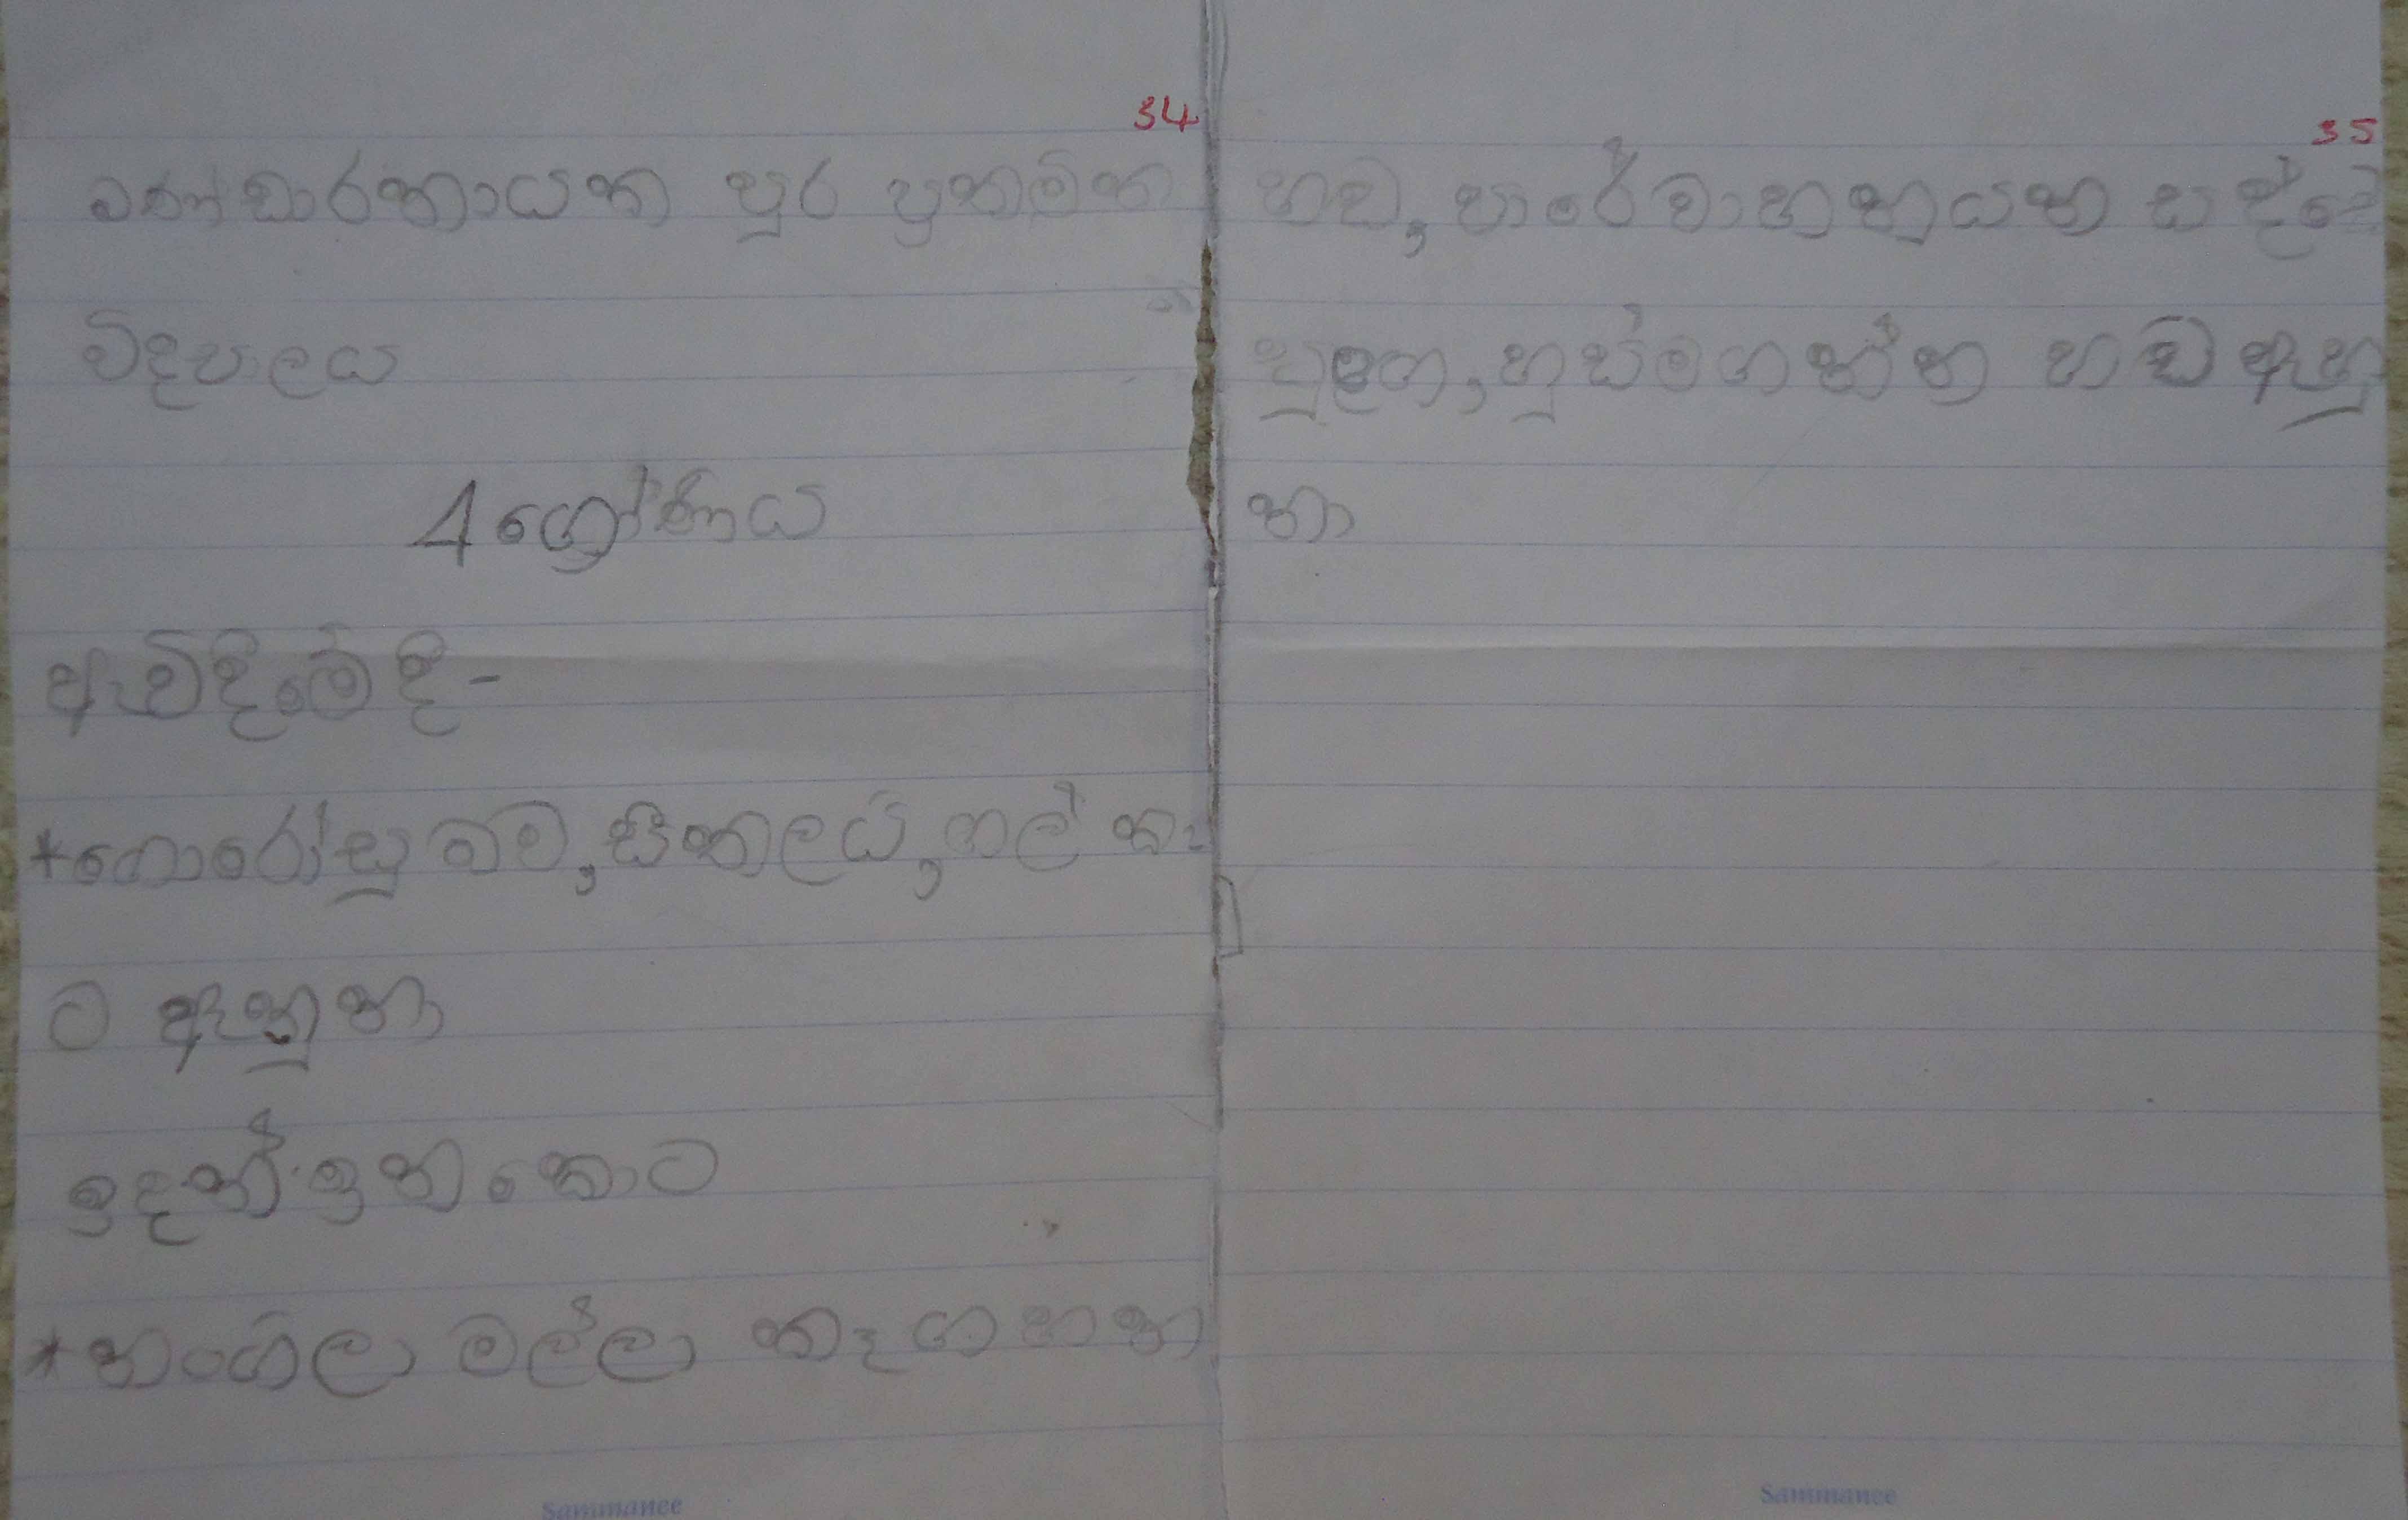 Feedback from students-WP GM Bandaranayakepura Primary School, Kirindiwela (13)